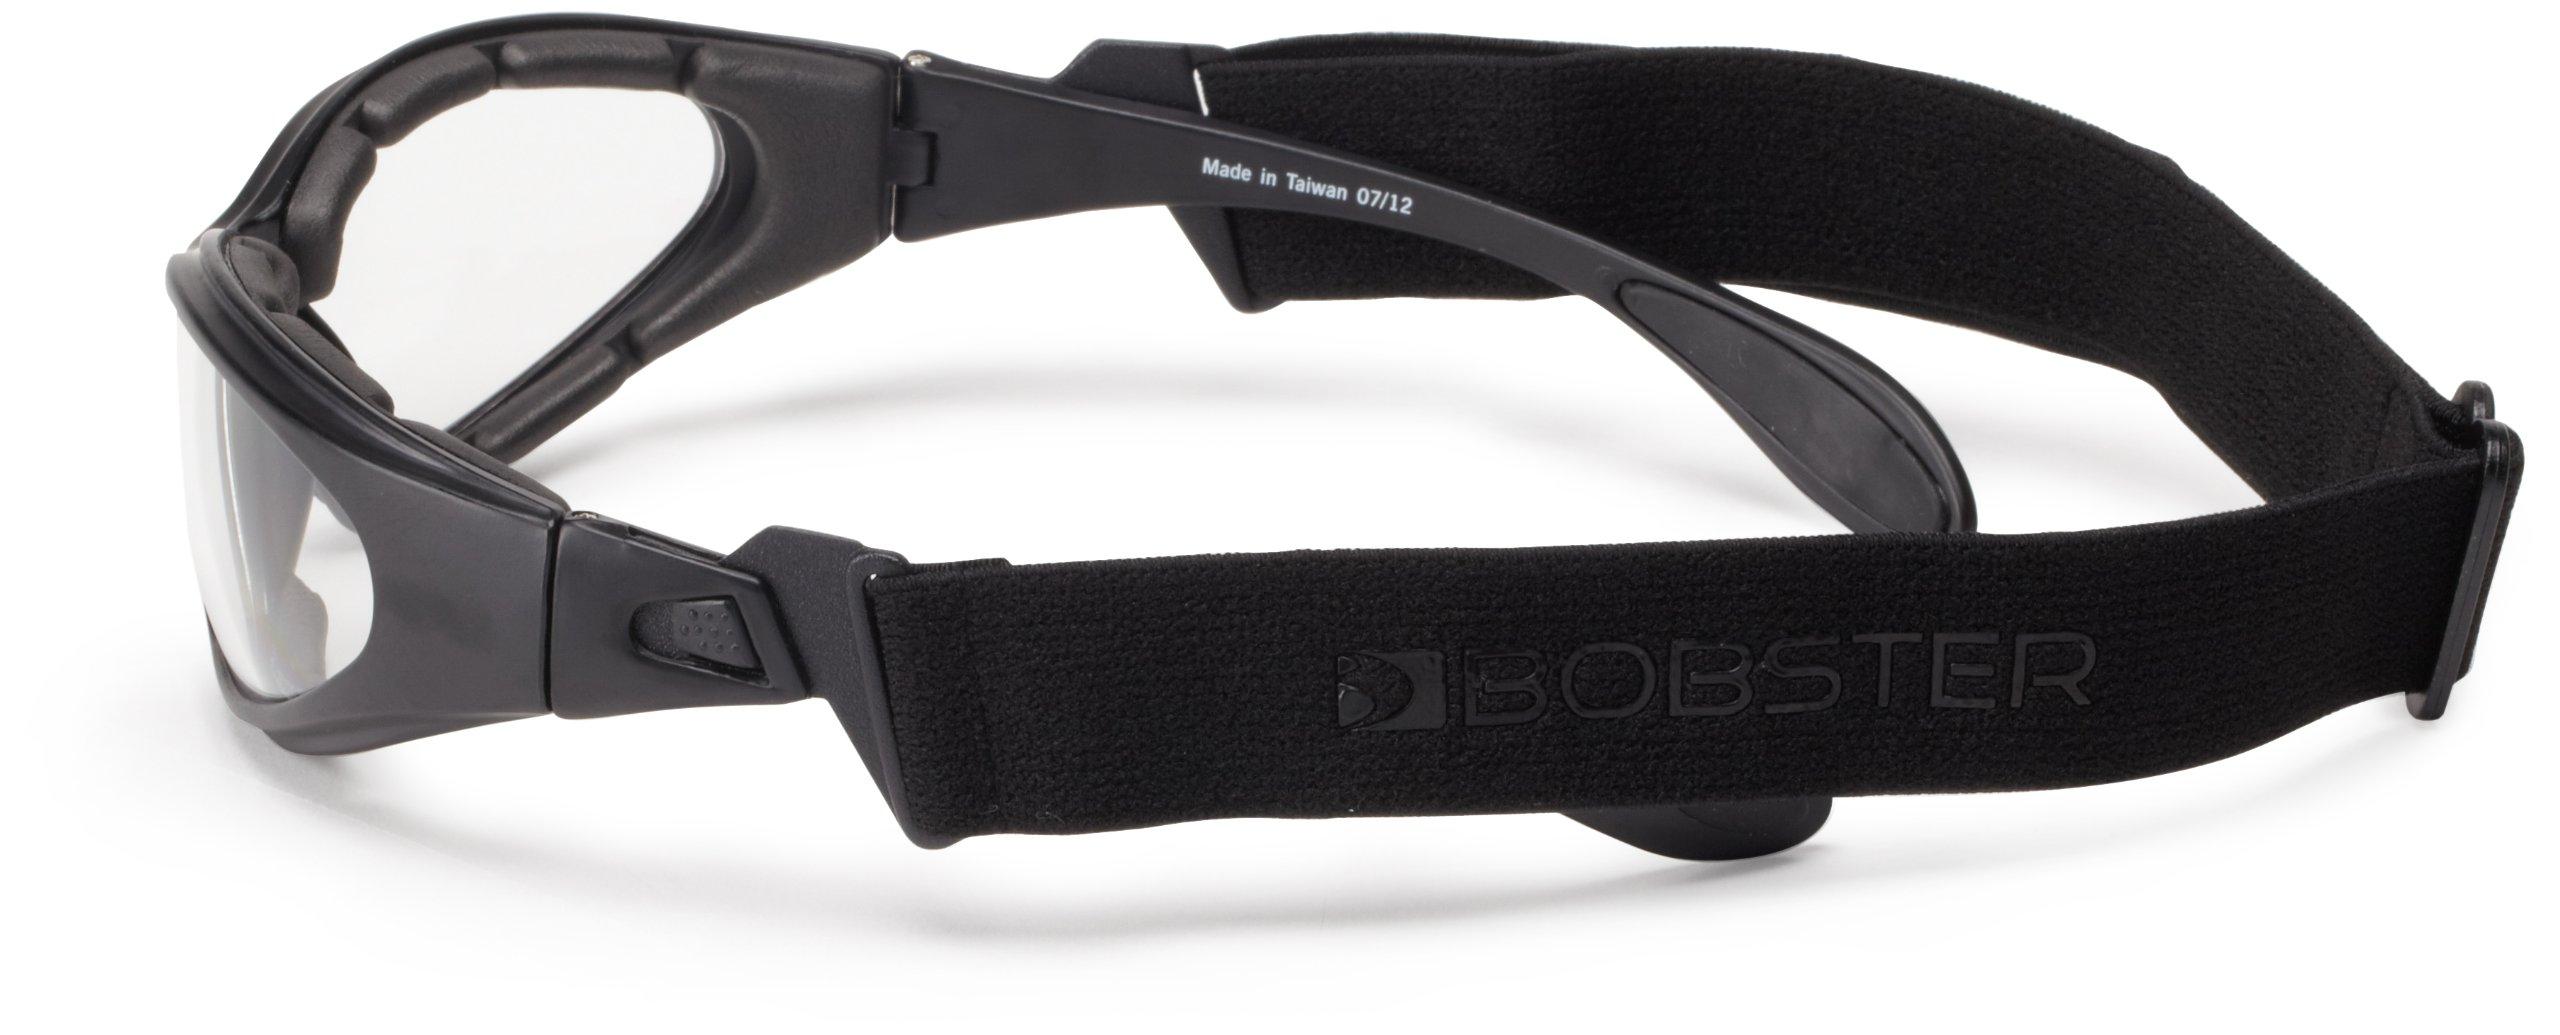 Bobster GXR Sport Sunglasses,Black Frame/Clear Lens,one size by Bobster (Image #7)